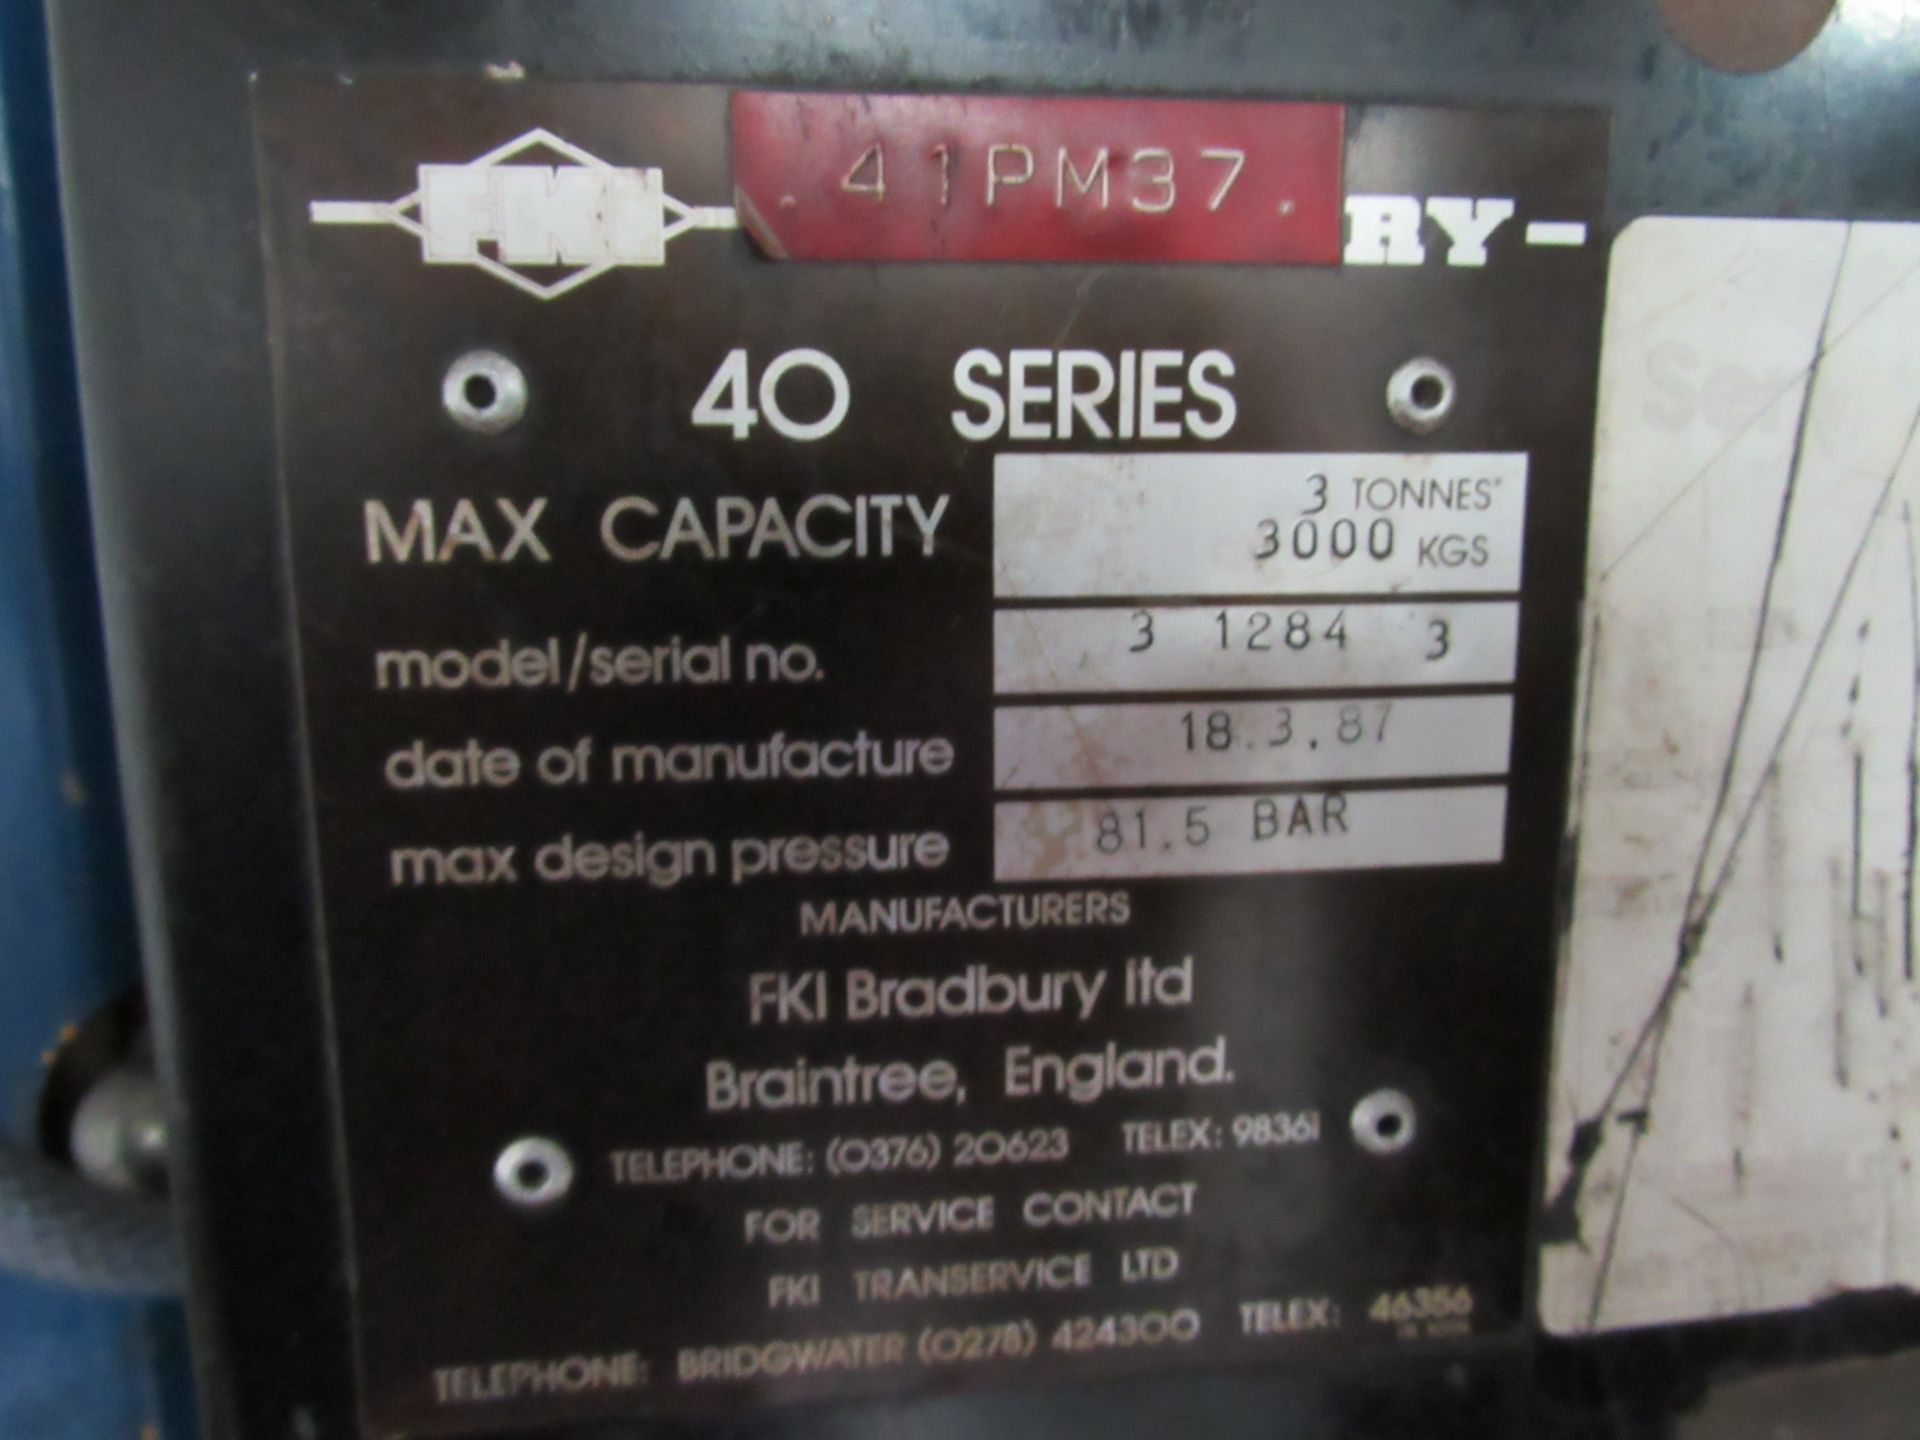 Lot 43 - Bradbury 3 1284 3 40 Series 4 Post Vehicle Lift 3000kg, Year 1987 (Located at Unit 11)